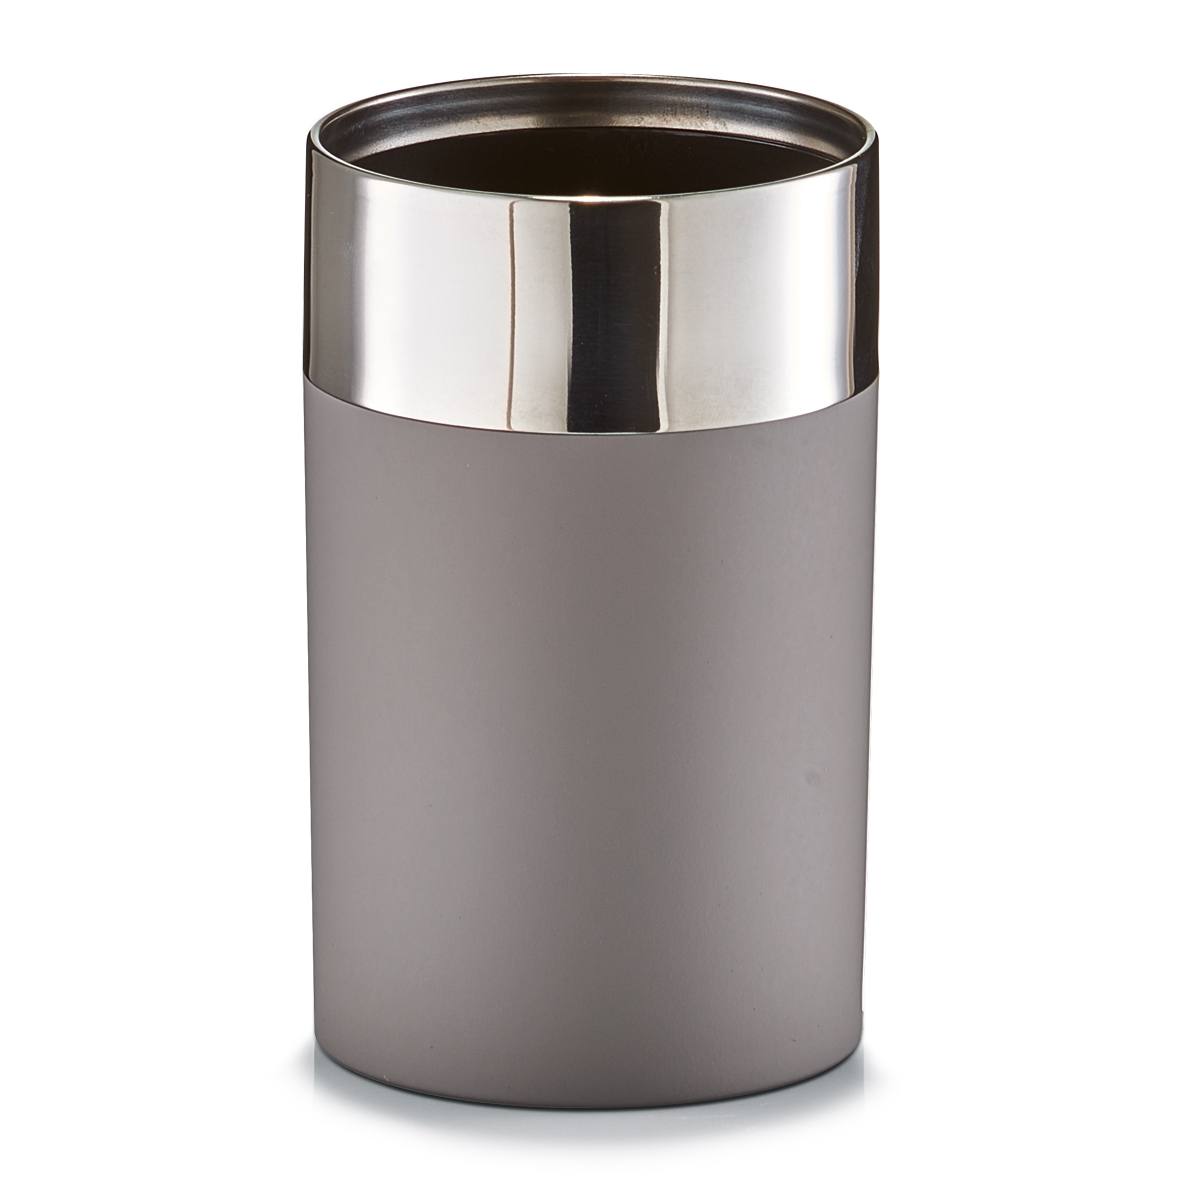 Pahar pentru periuta din plastic si inox, Taupe matte, Ø 6,5xH11 cm imagine